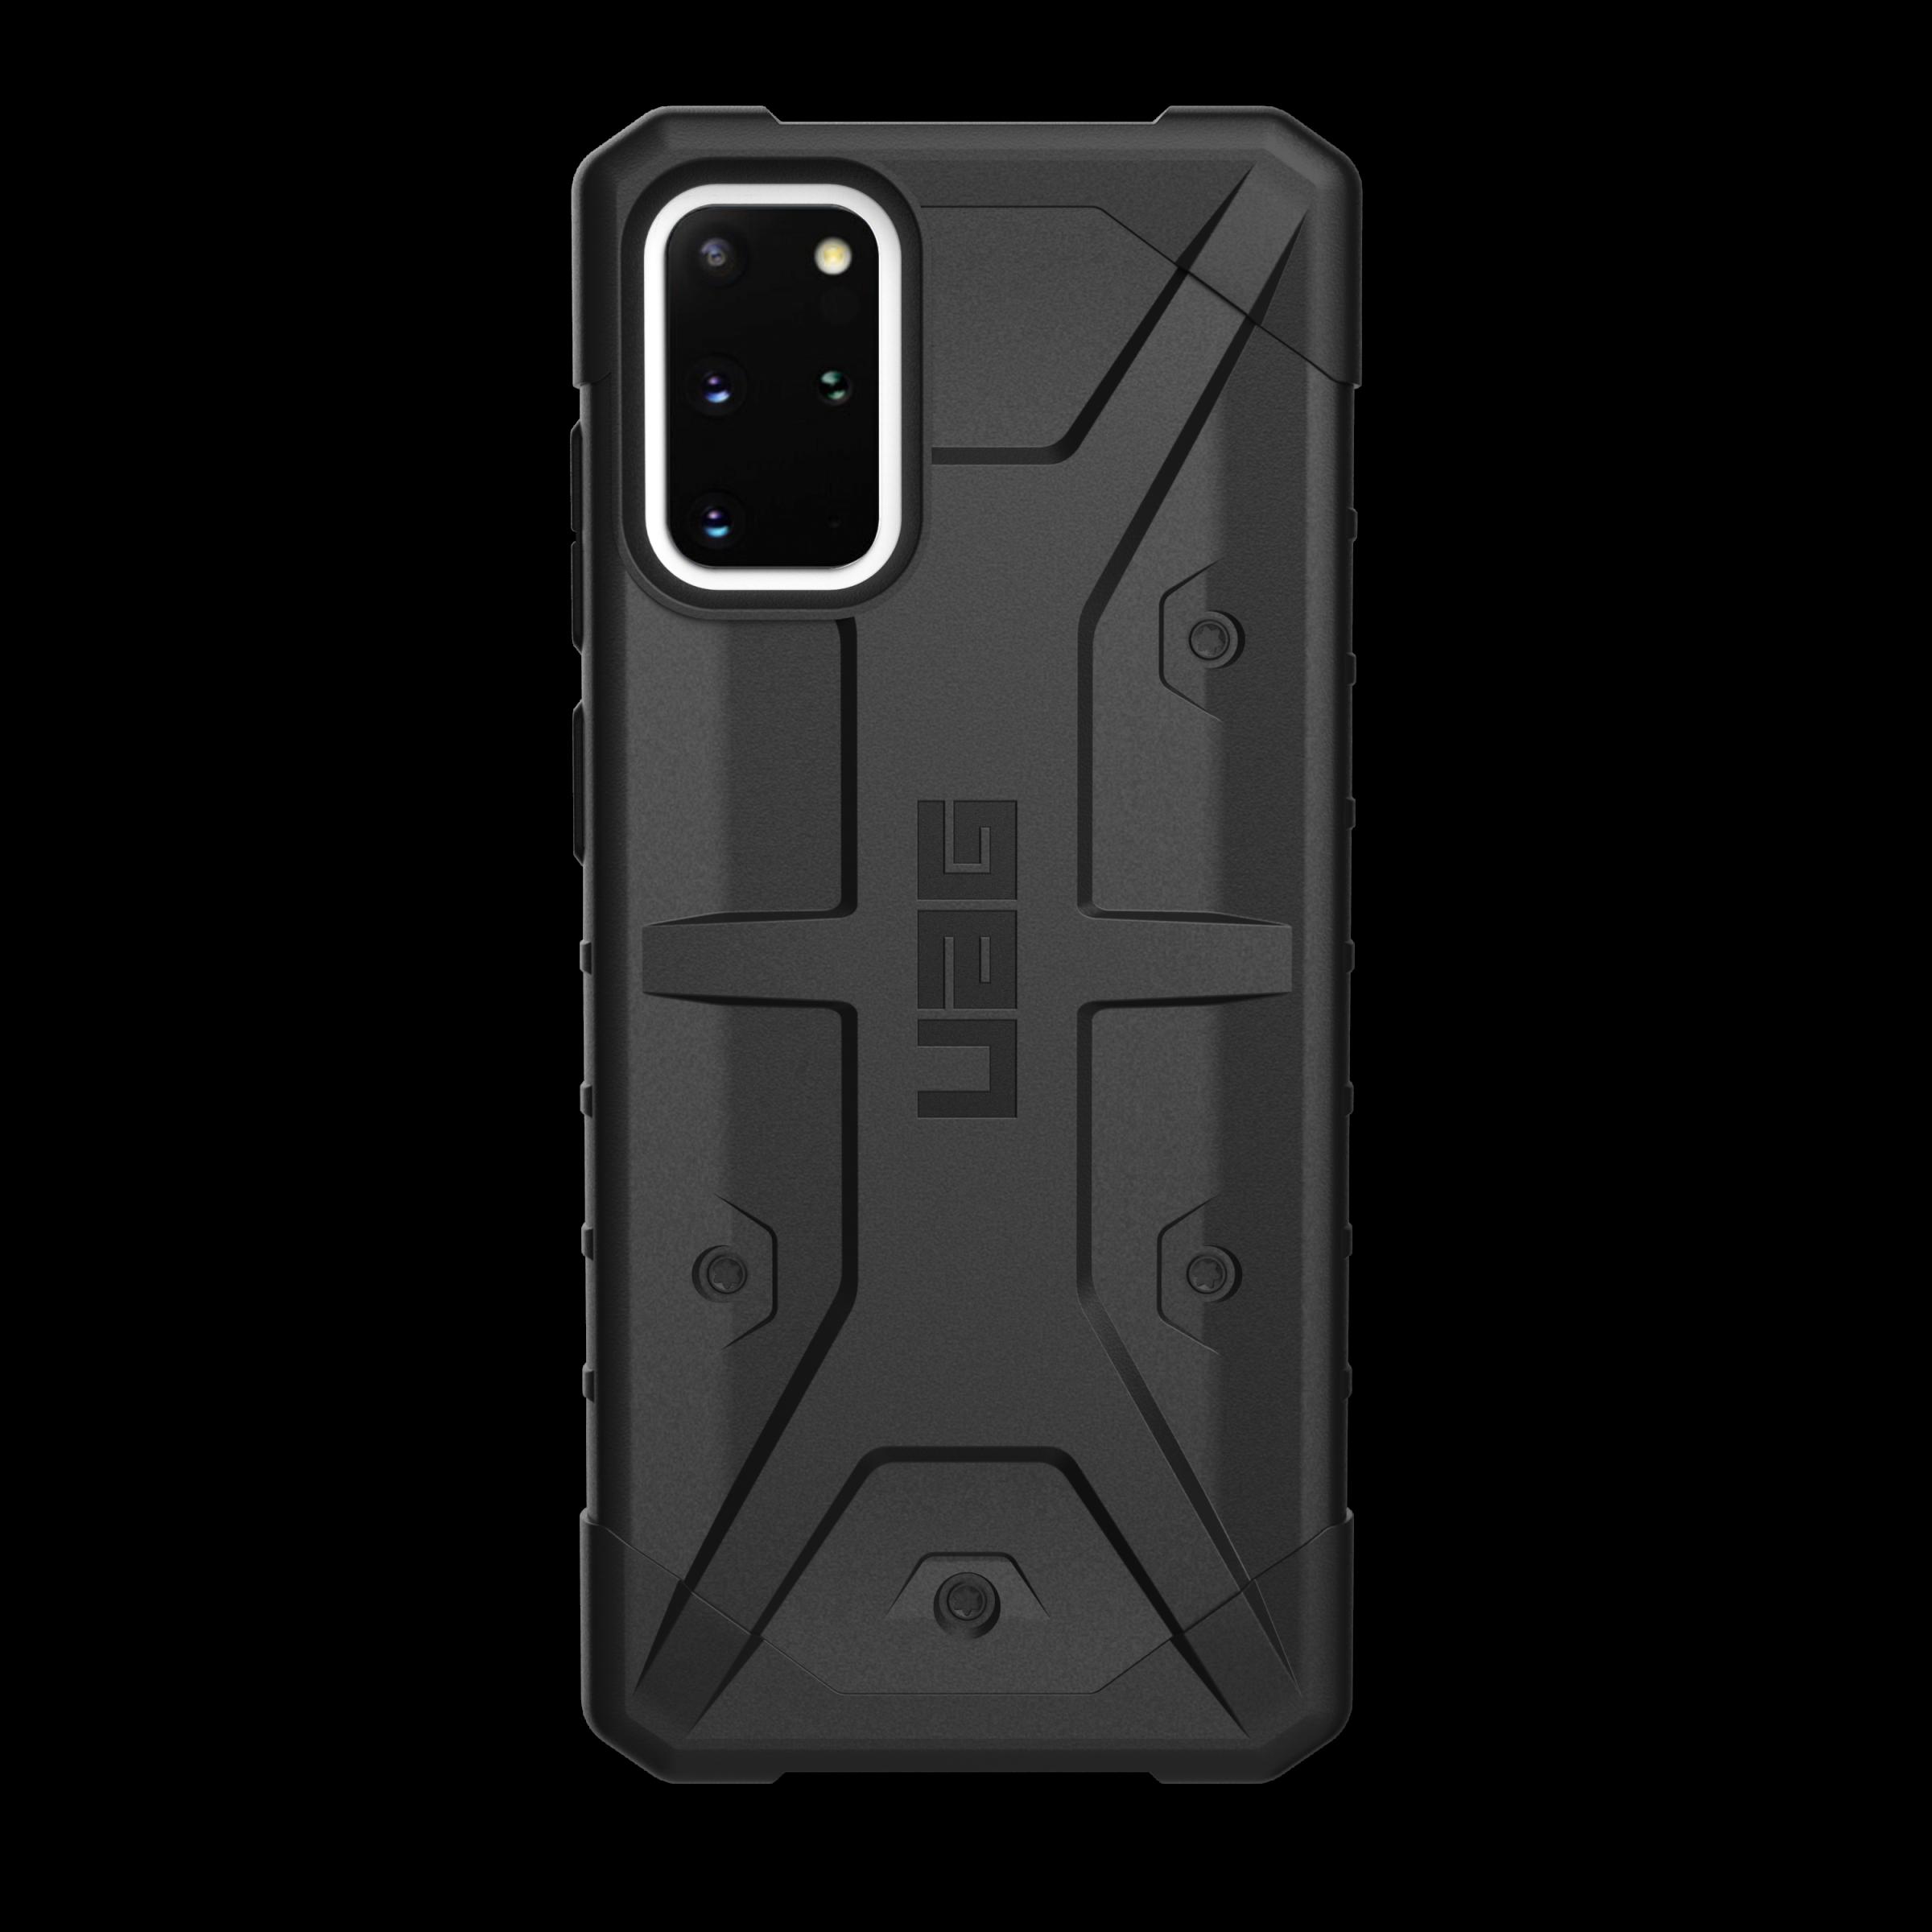 Pathfinder Series Case Galaxy S20 Plus Black